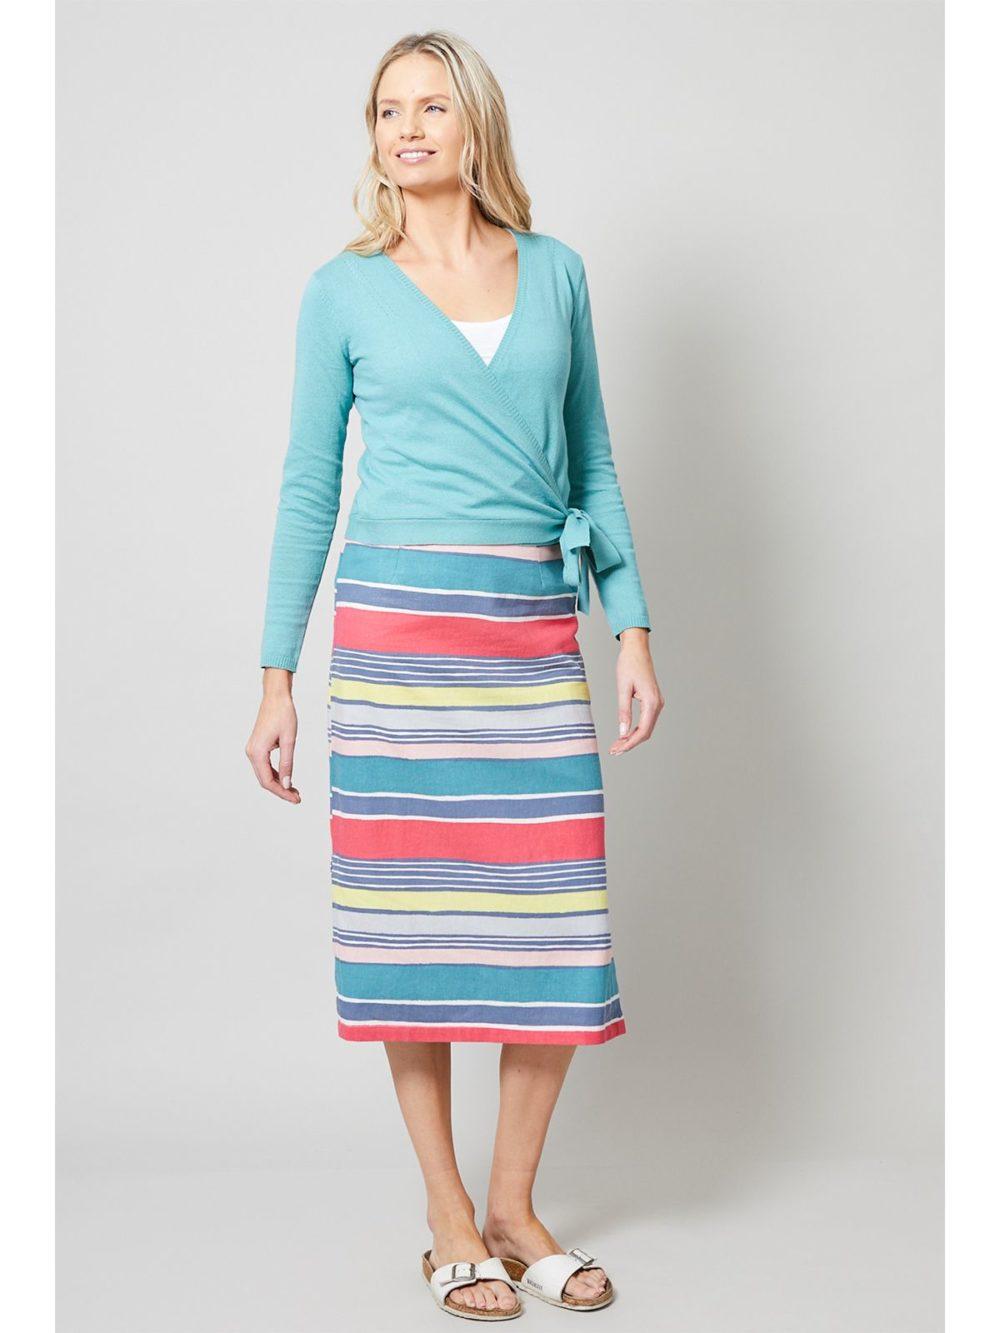 Midi Skirt Stripe Lily and Me Katie Kerr Women's Clothing